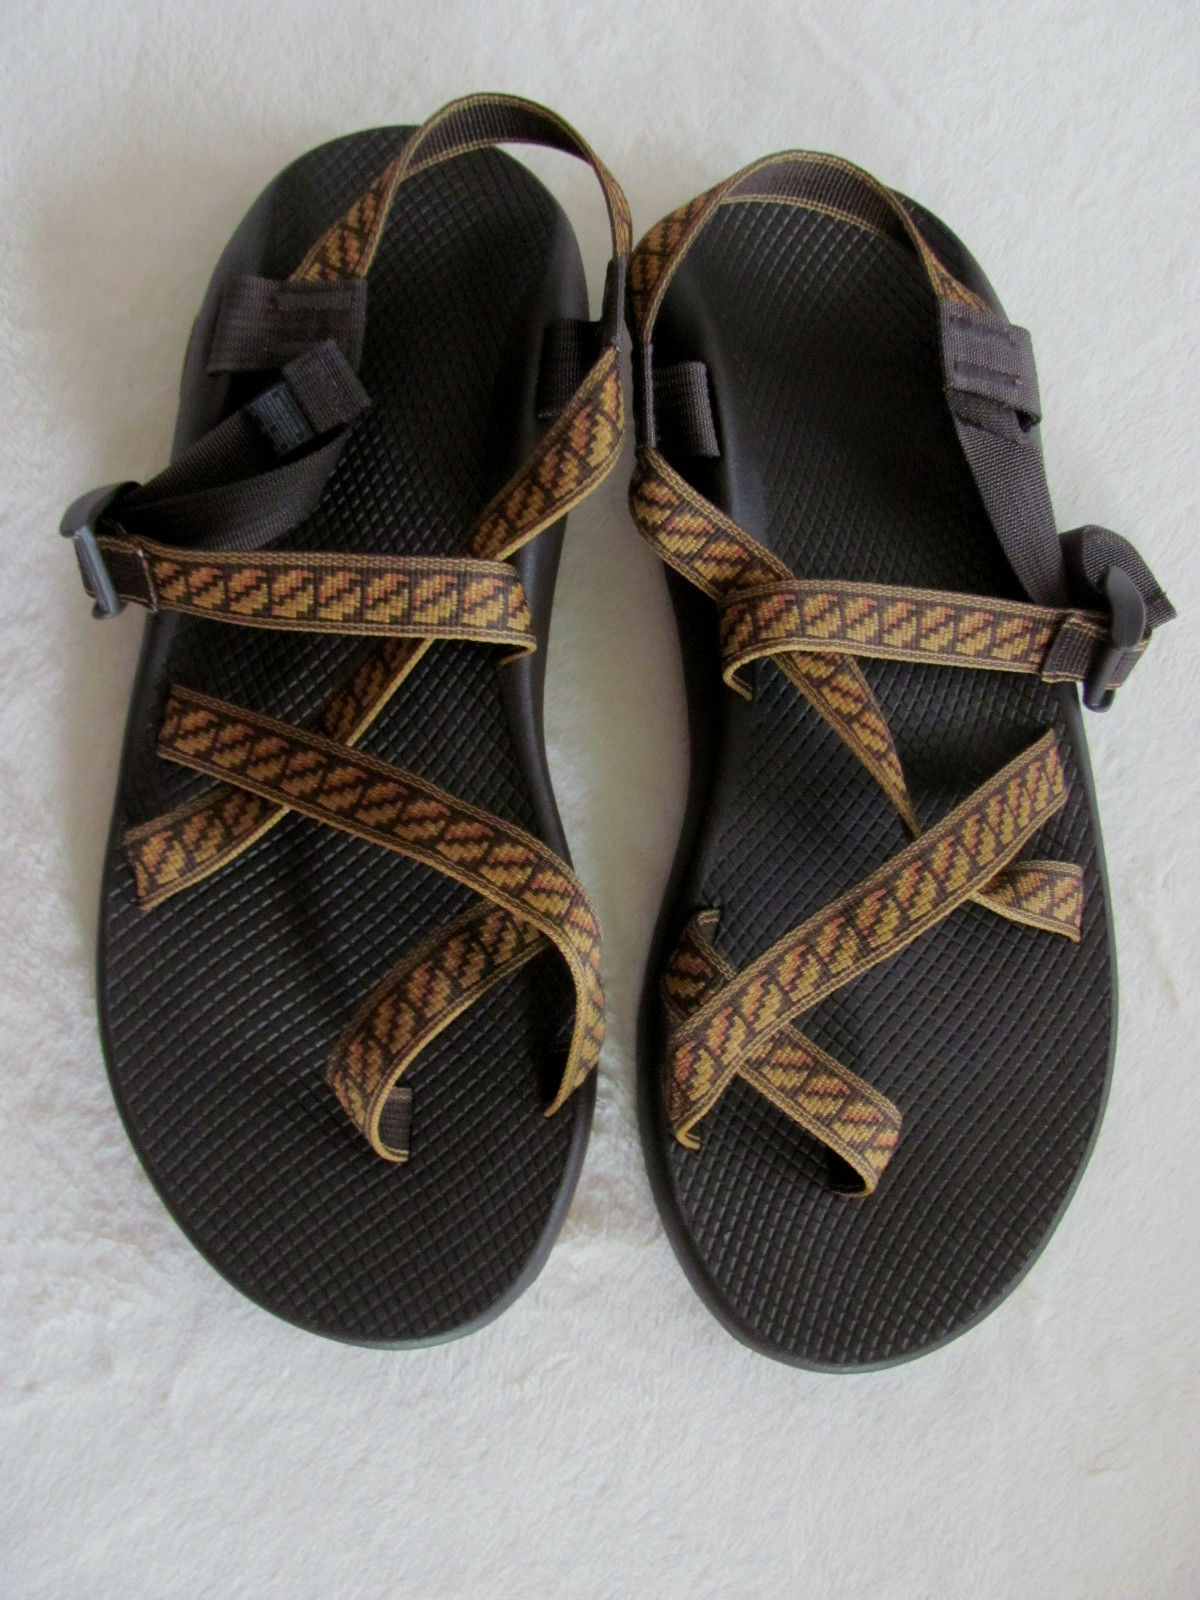 Chaco Z/2 Classic Toe Loop Sport Sandals-Filmstrip Copper -Uomo Taglia 14-EU 47-NIB